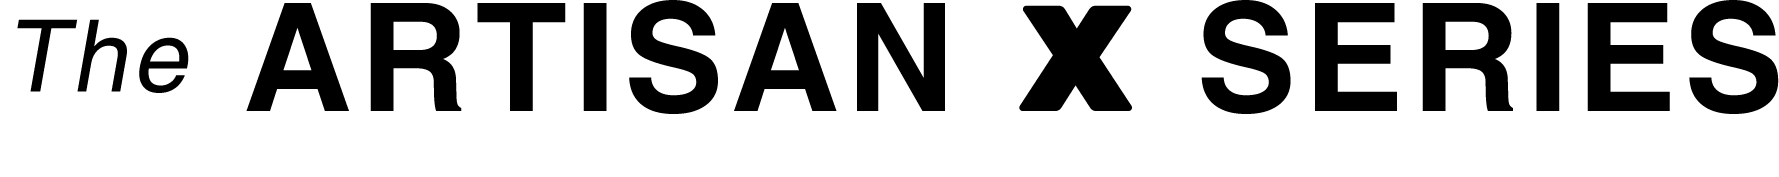 xrlogo